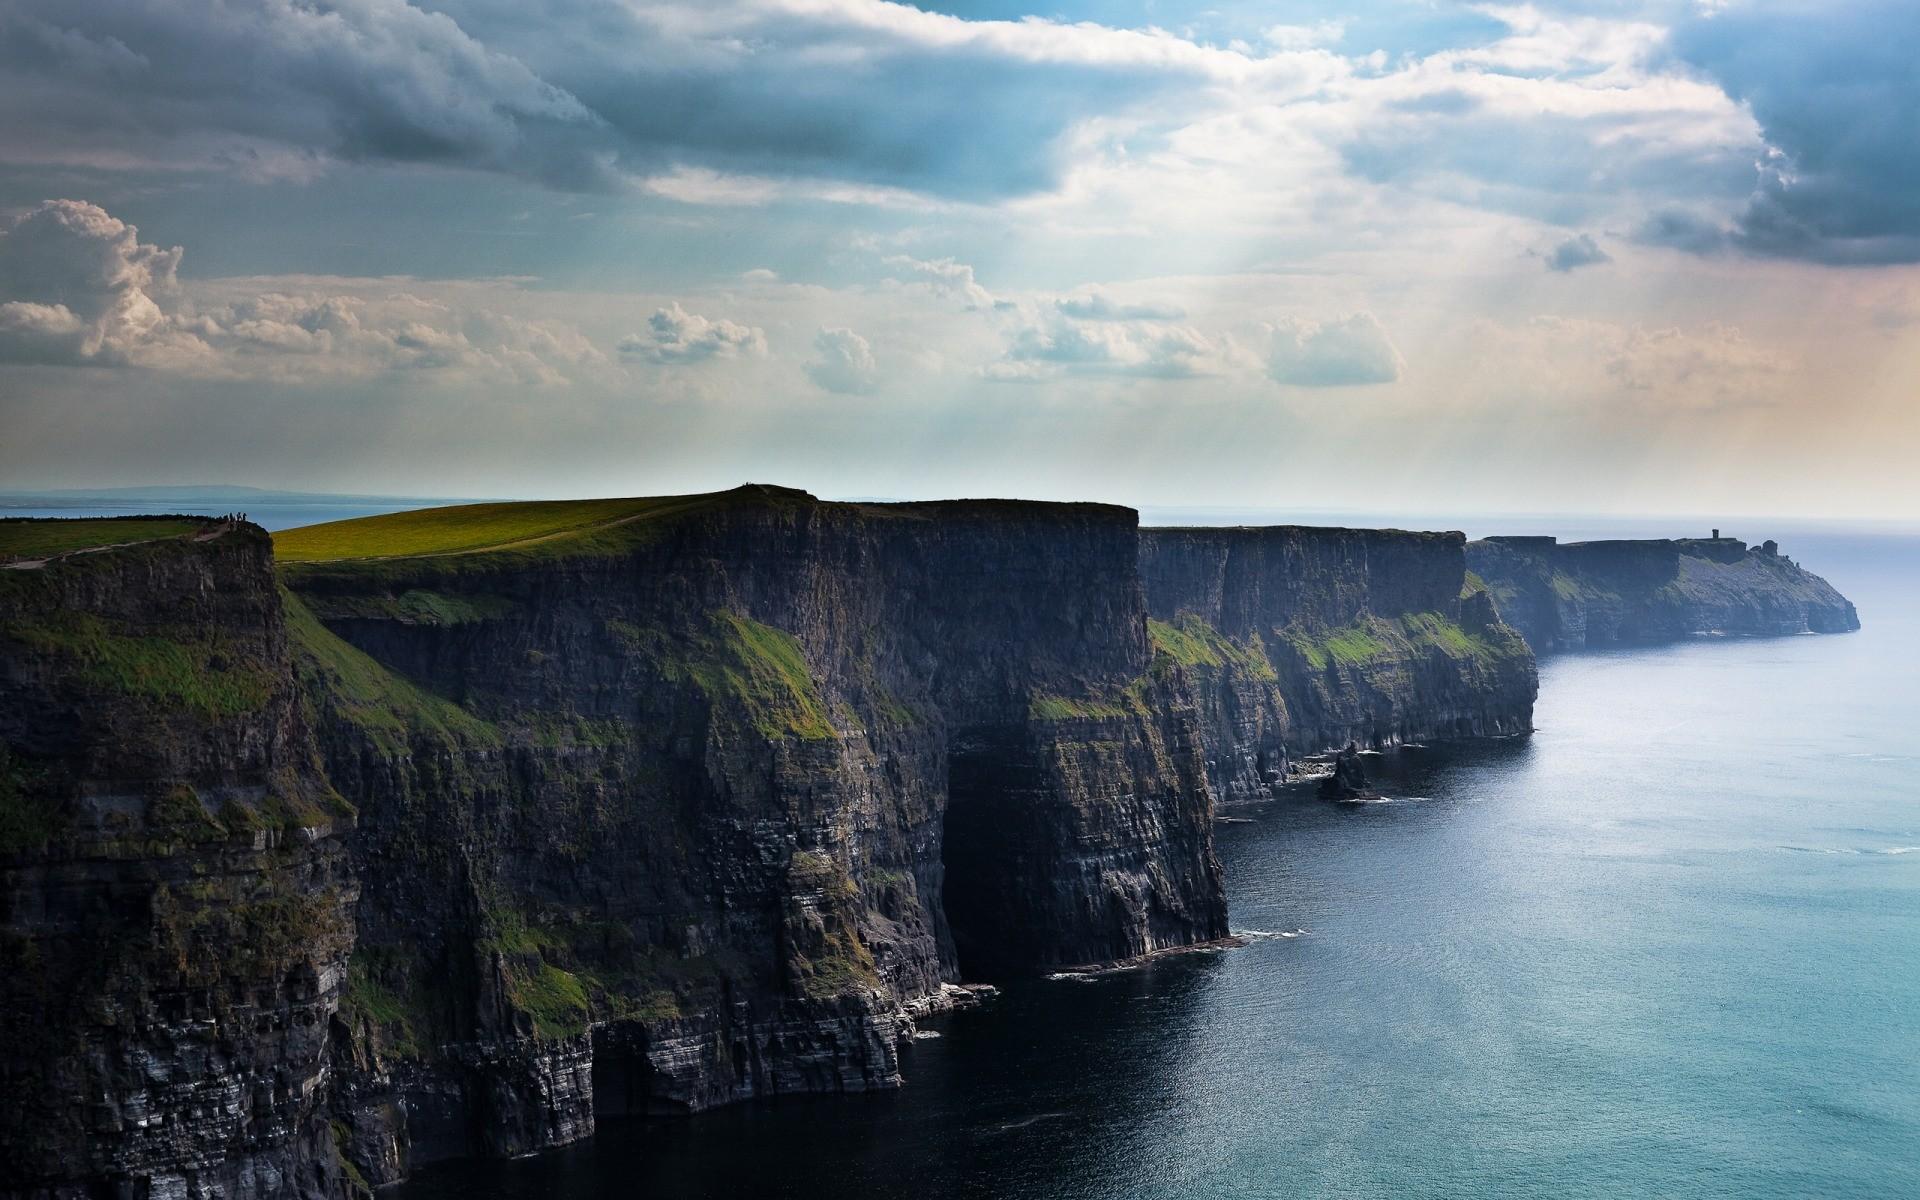 moher, ireland, wallpaper, scenic, cliffs, wallpapers, popular .